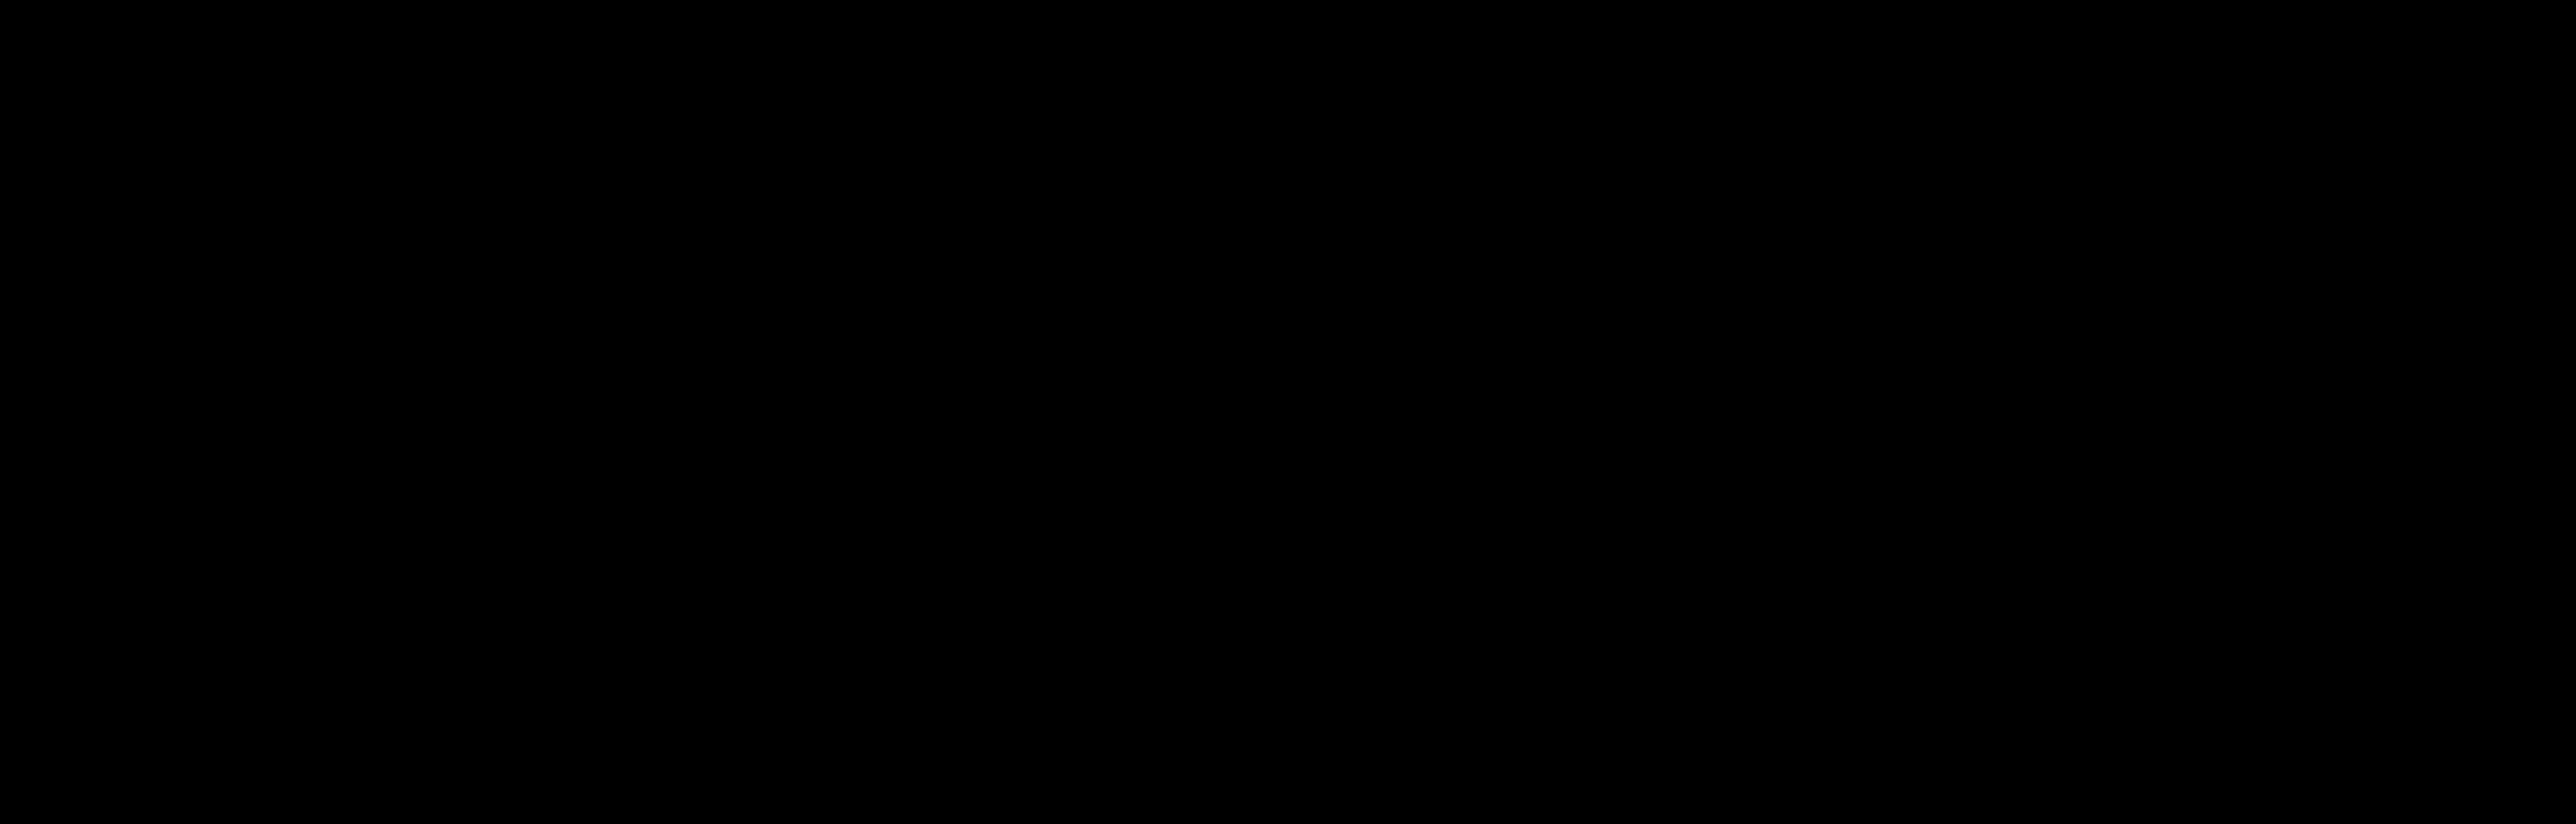 логотип компании HI-Space